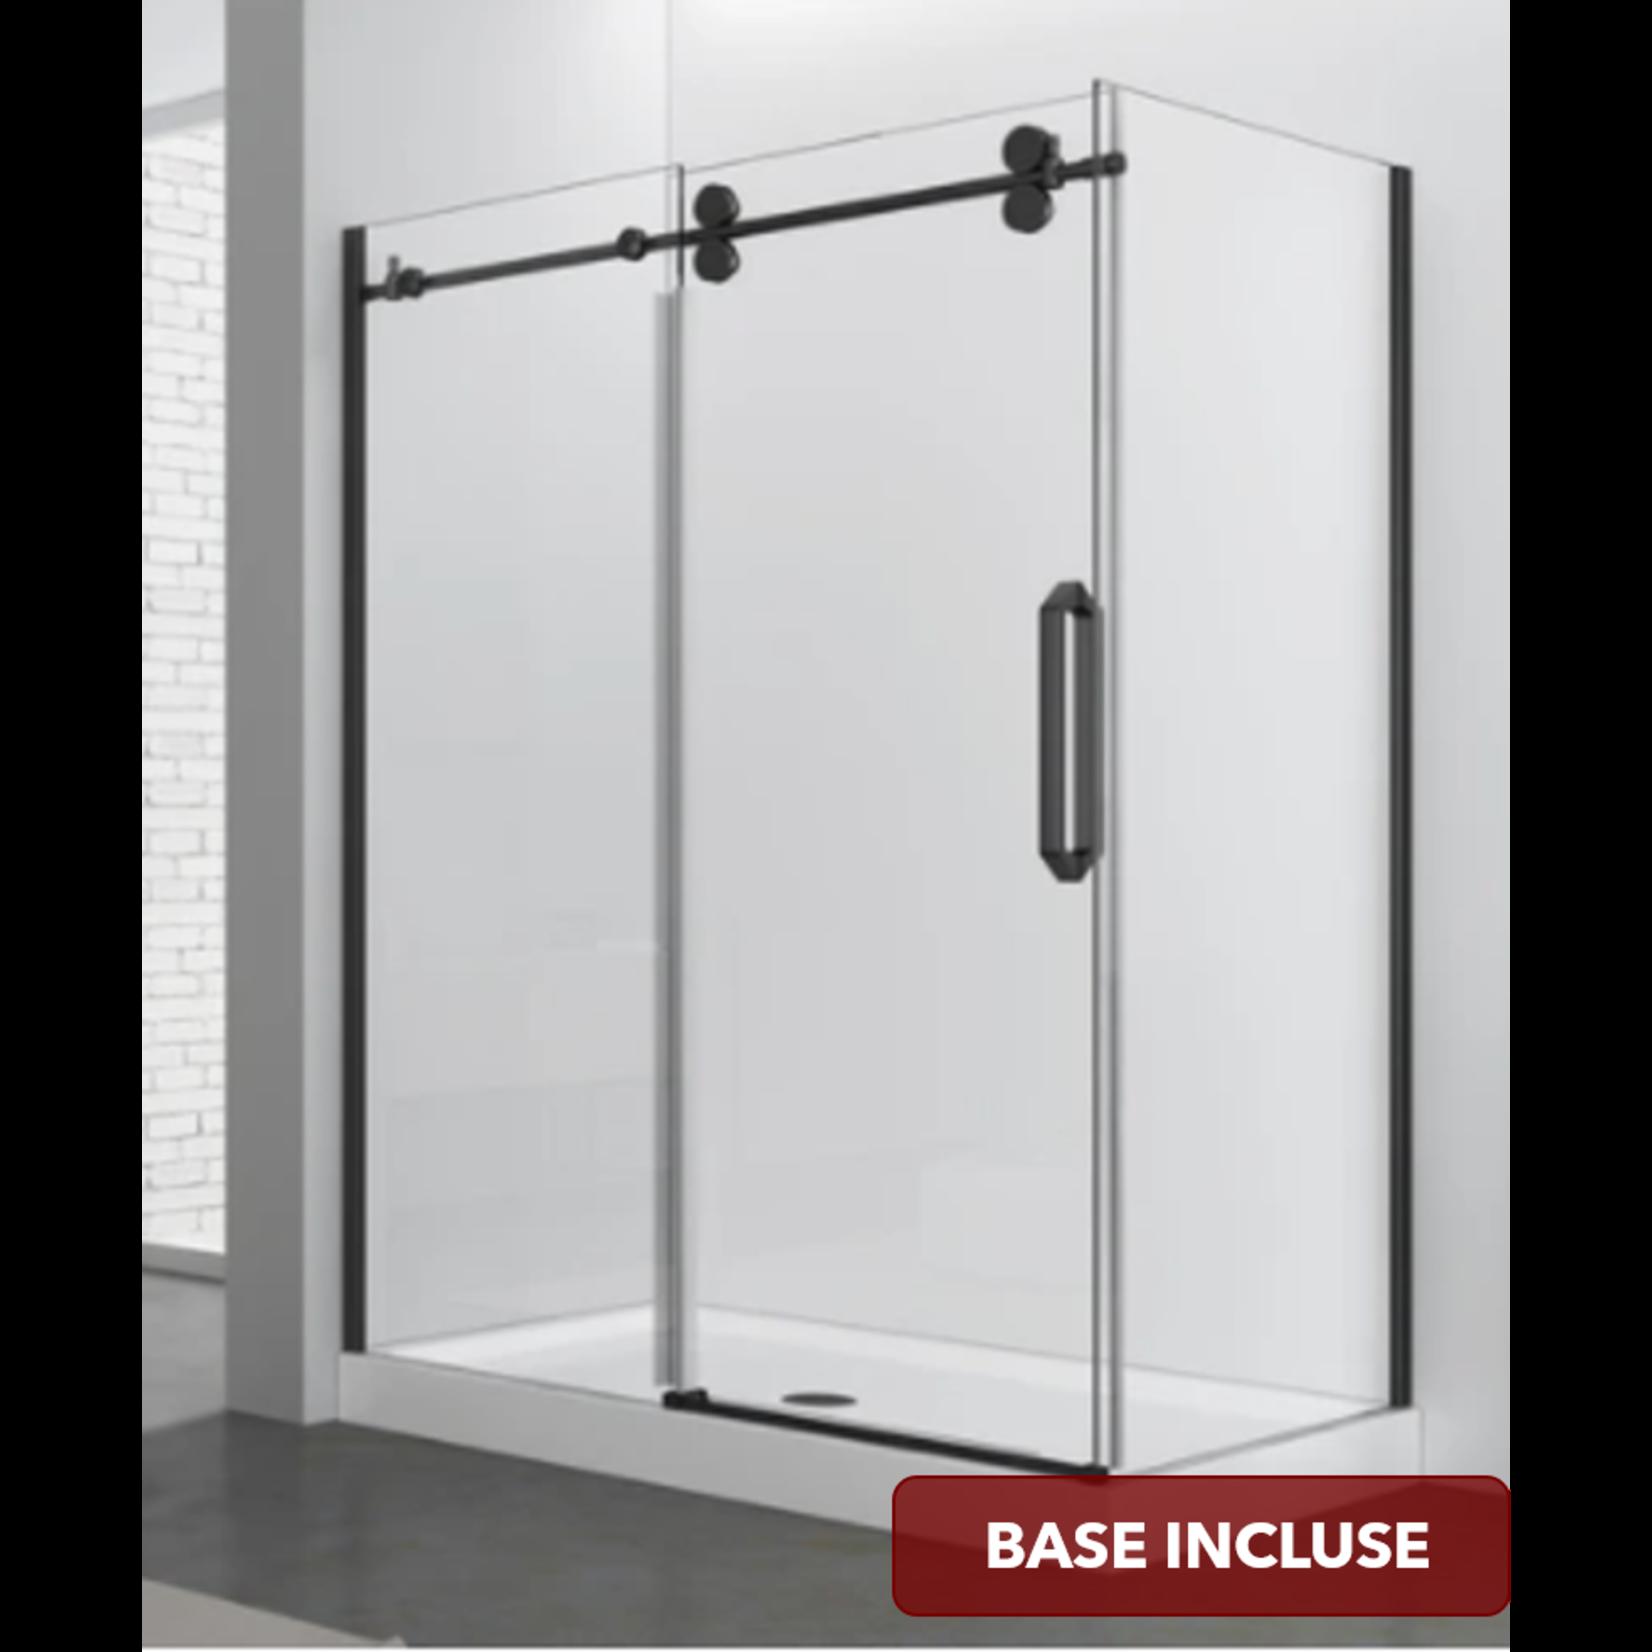 Reversible shower set 36x48 matt black Zirkon Apo series